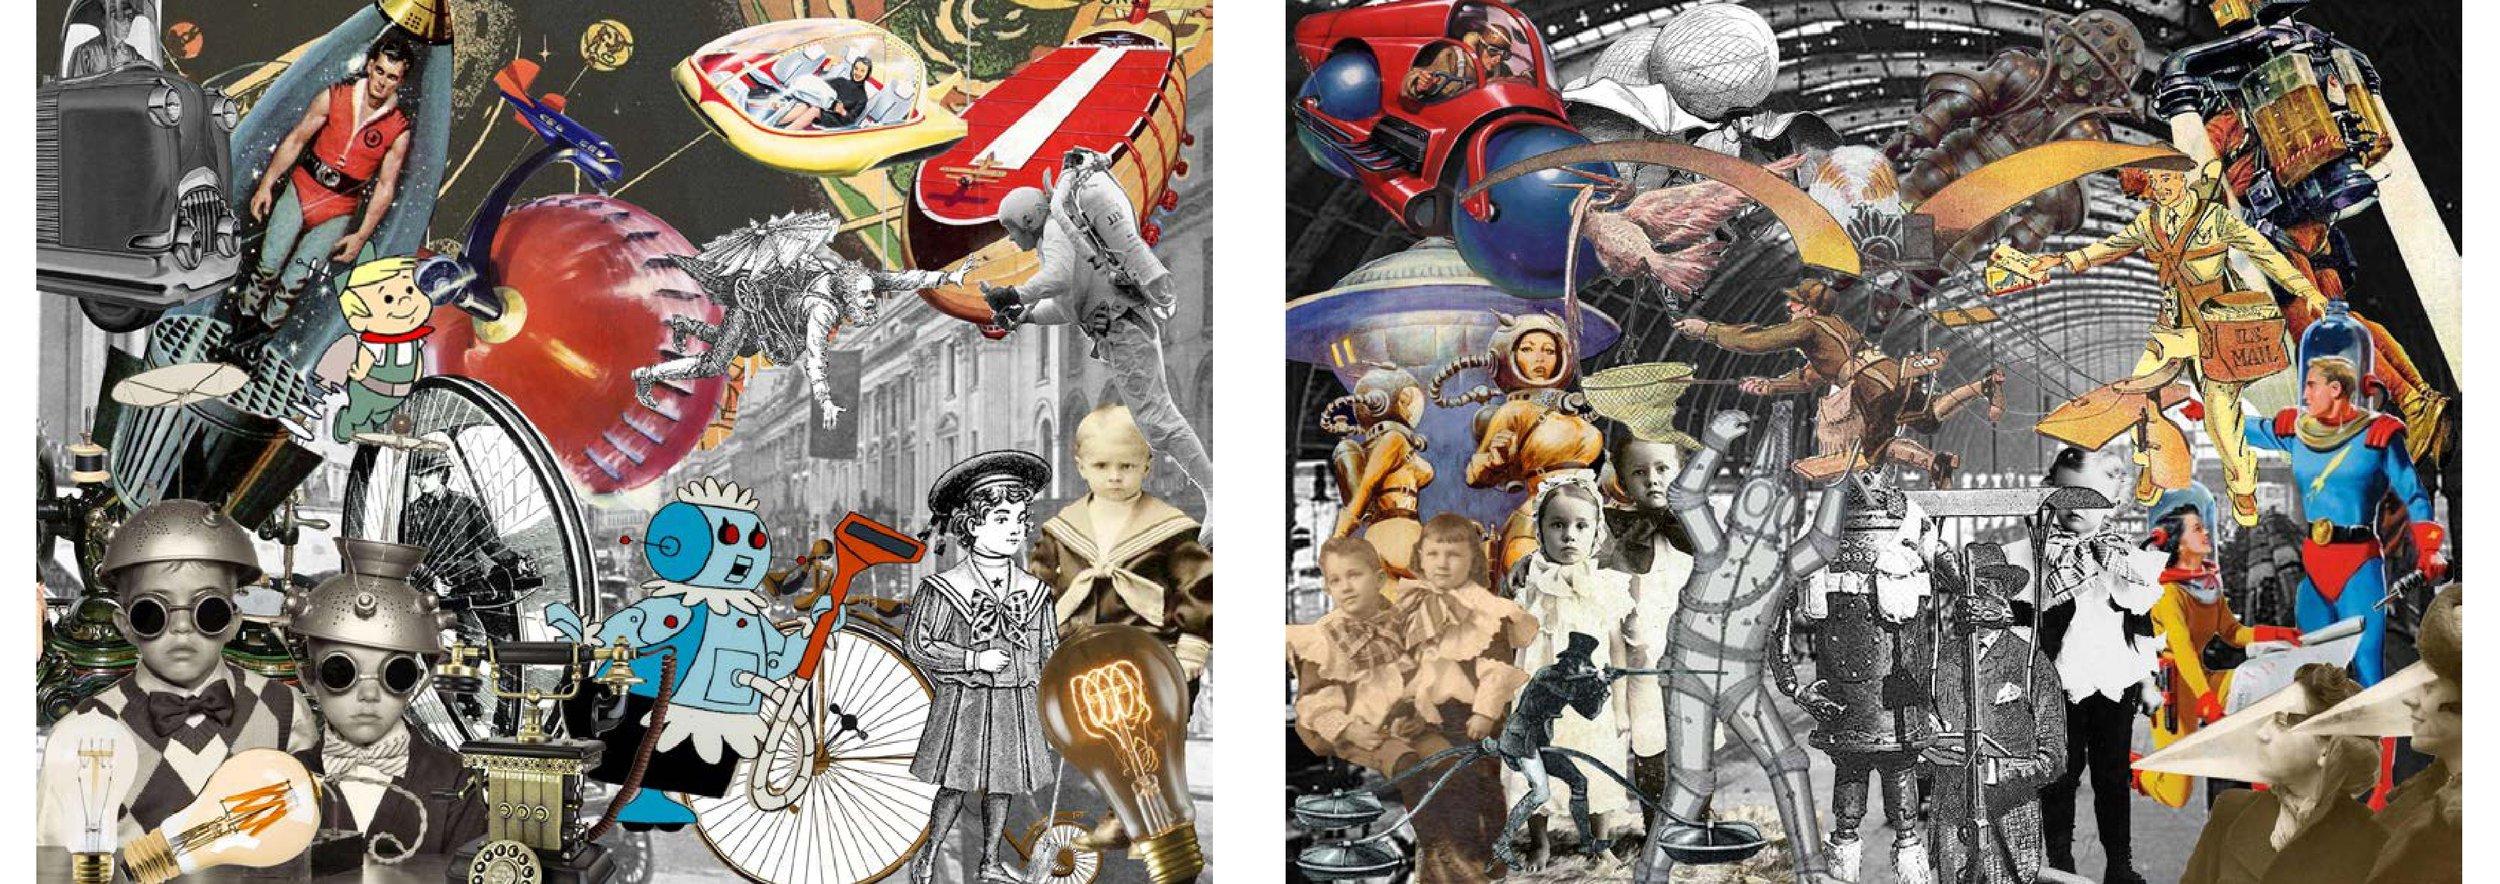 Tomorrowland(portfolio)_page-0008.jpg